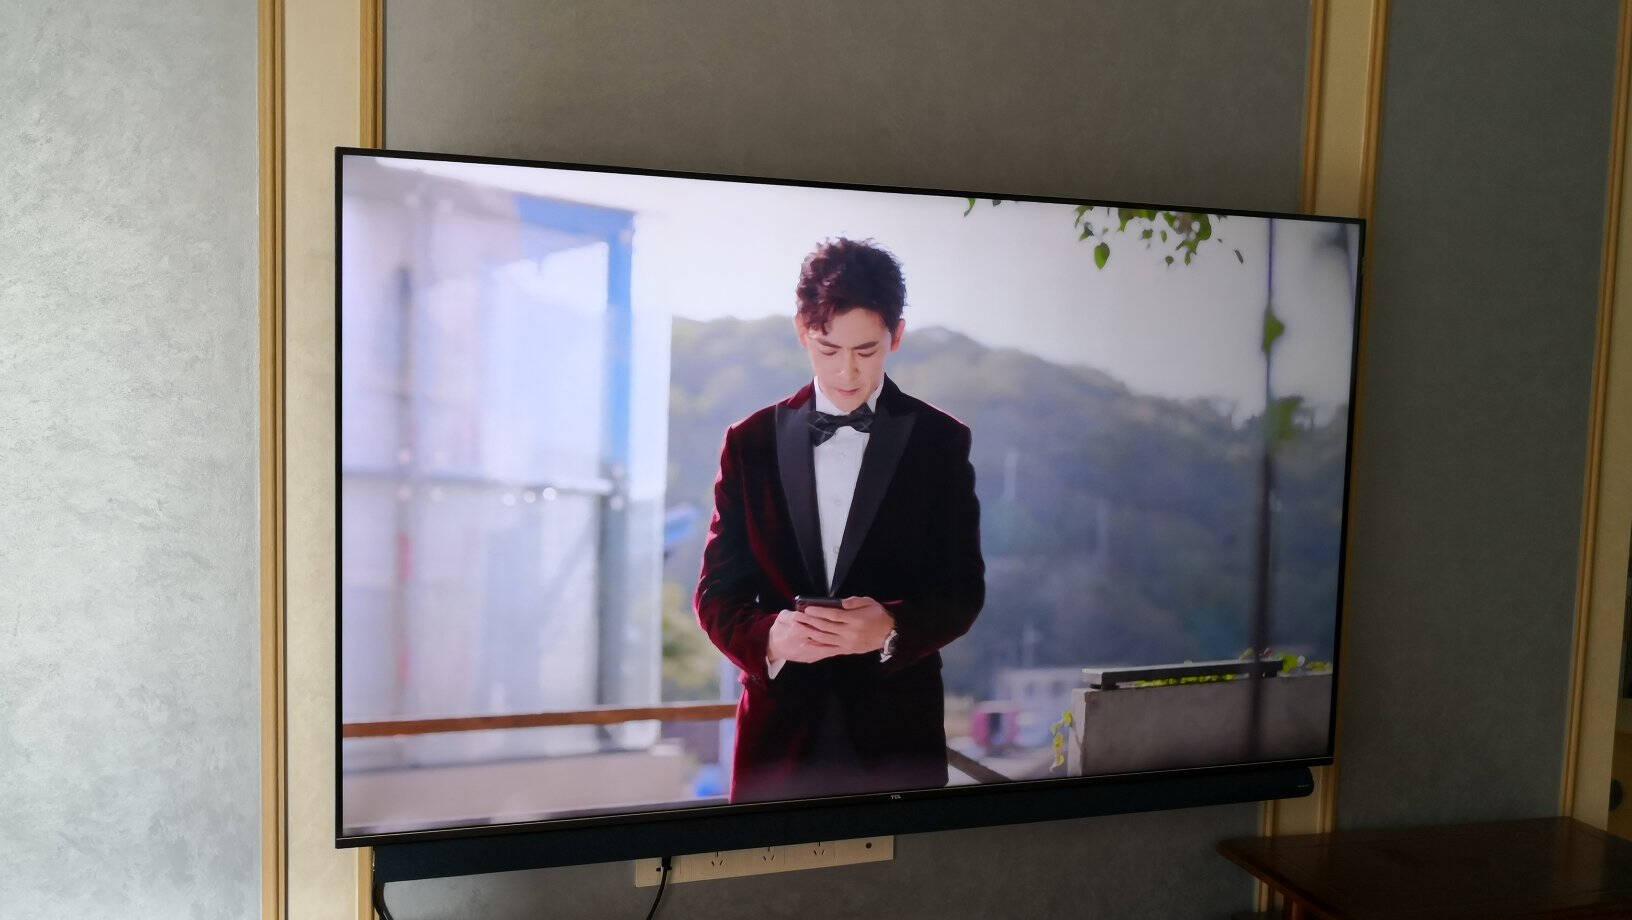 TCL智屏75V8-Pro75英寸130%高色域全面屏电视免遥控AI声控智慧屏2+32GB智能液晶平板电视机以旧换新